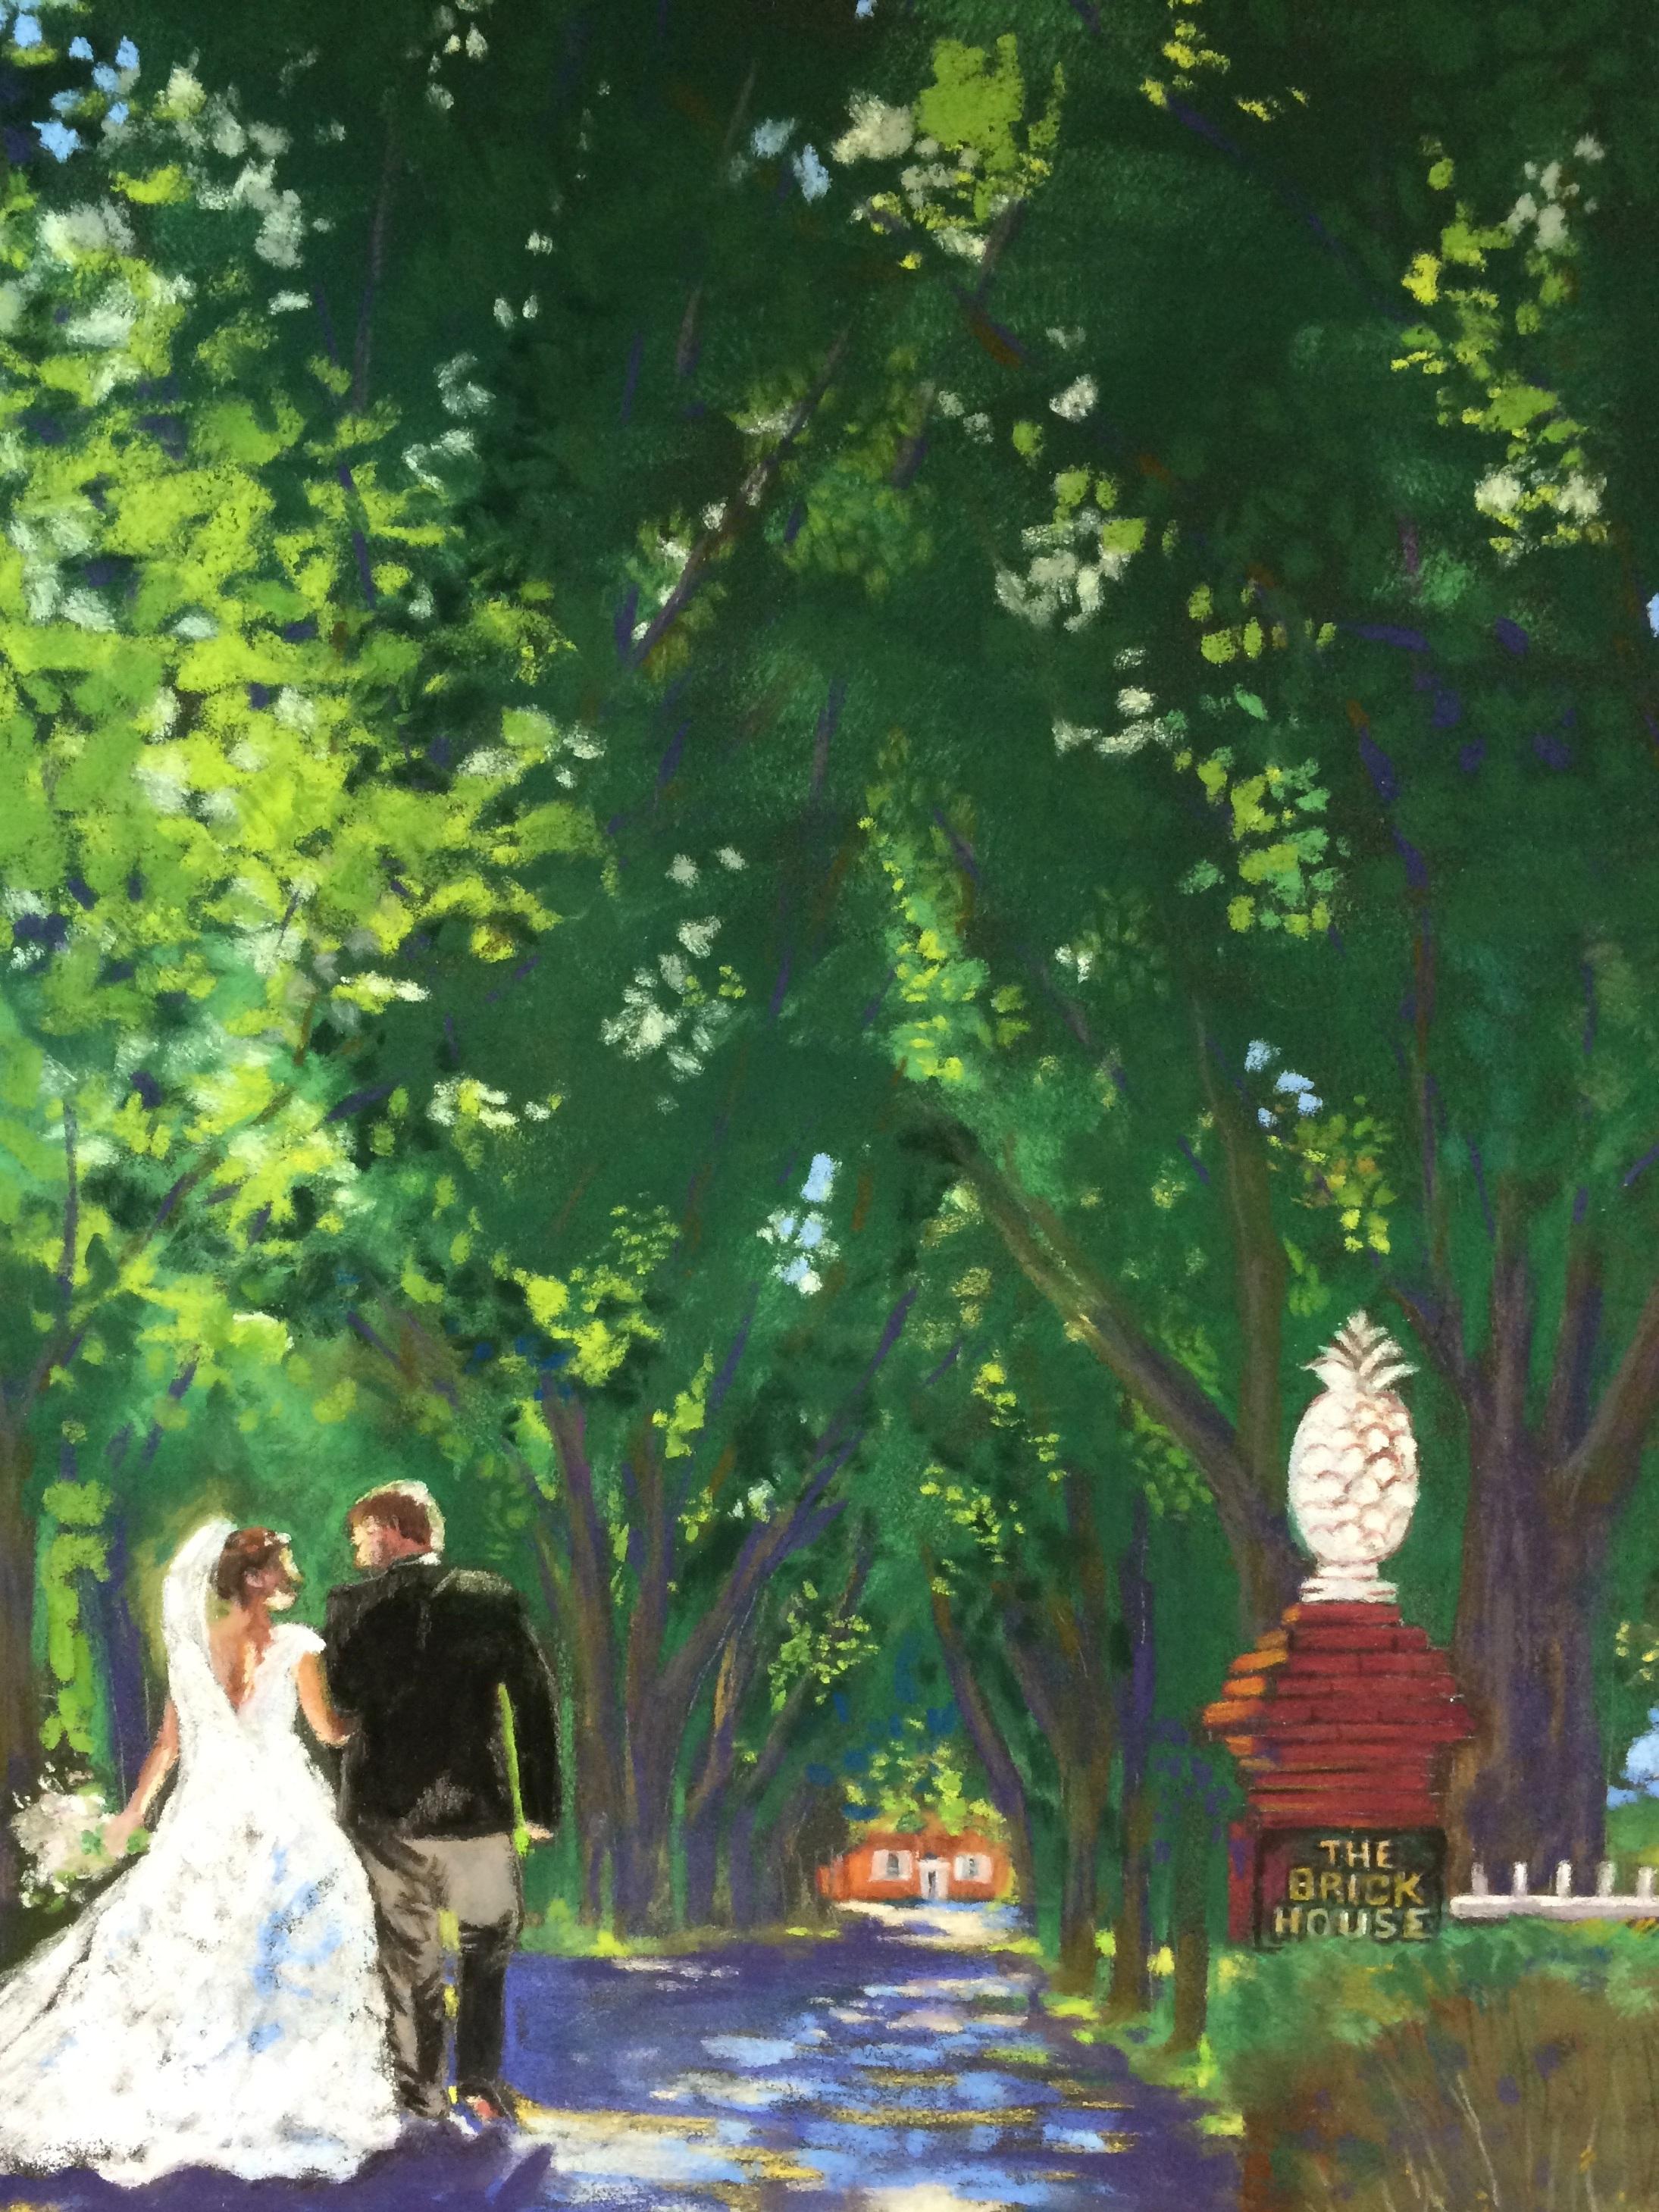 Wedding Walk Under a Canopy of Trees